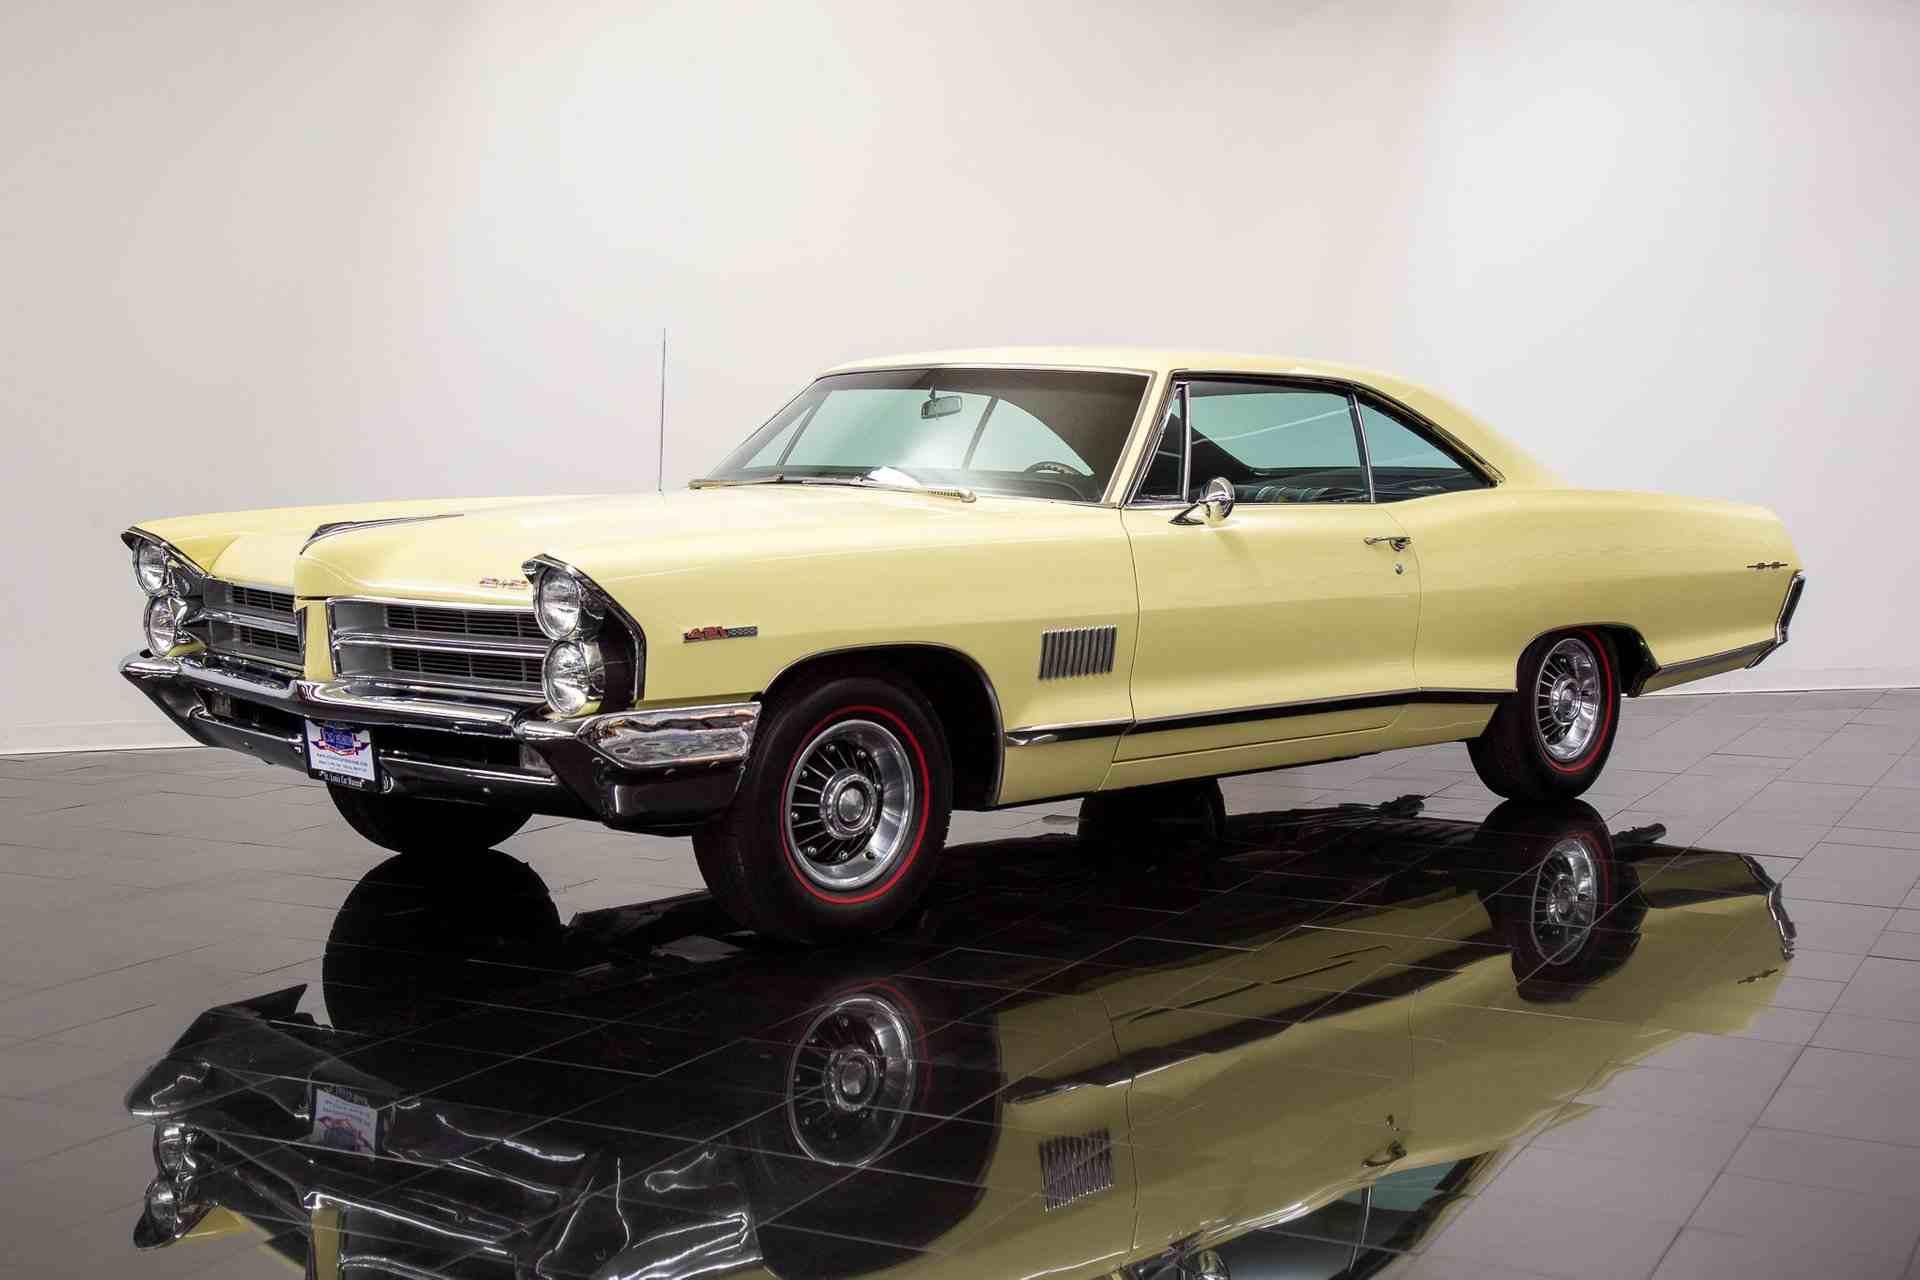 1965 Pontiac Catalina 2+2 Coupe for sale